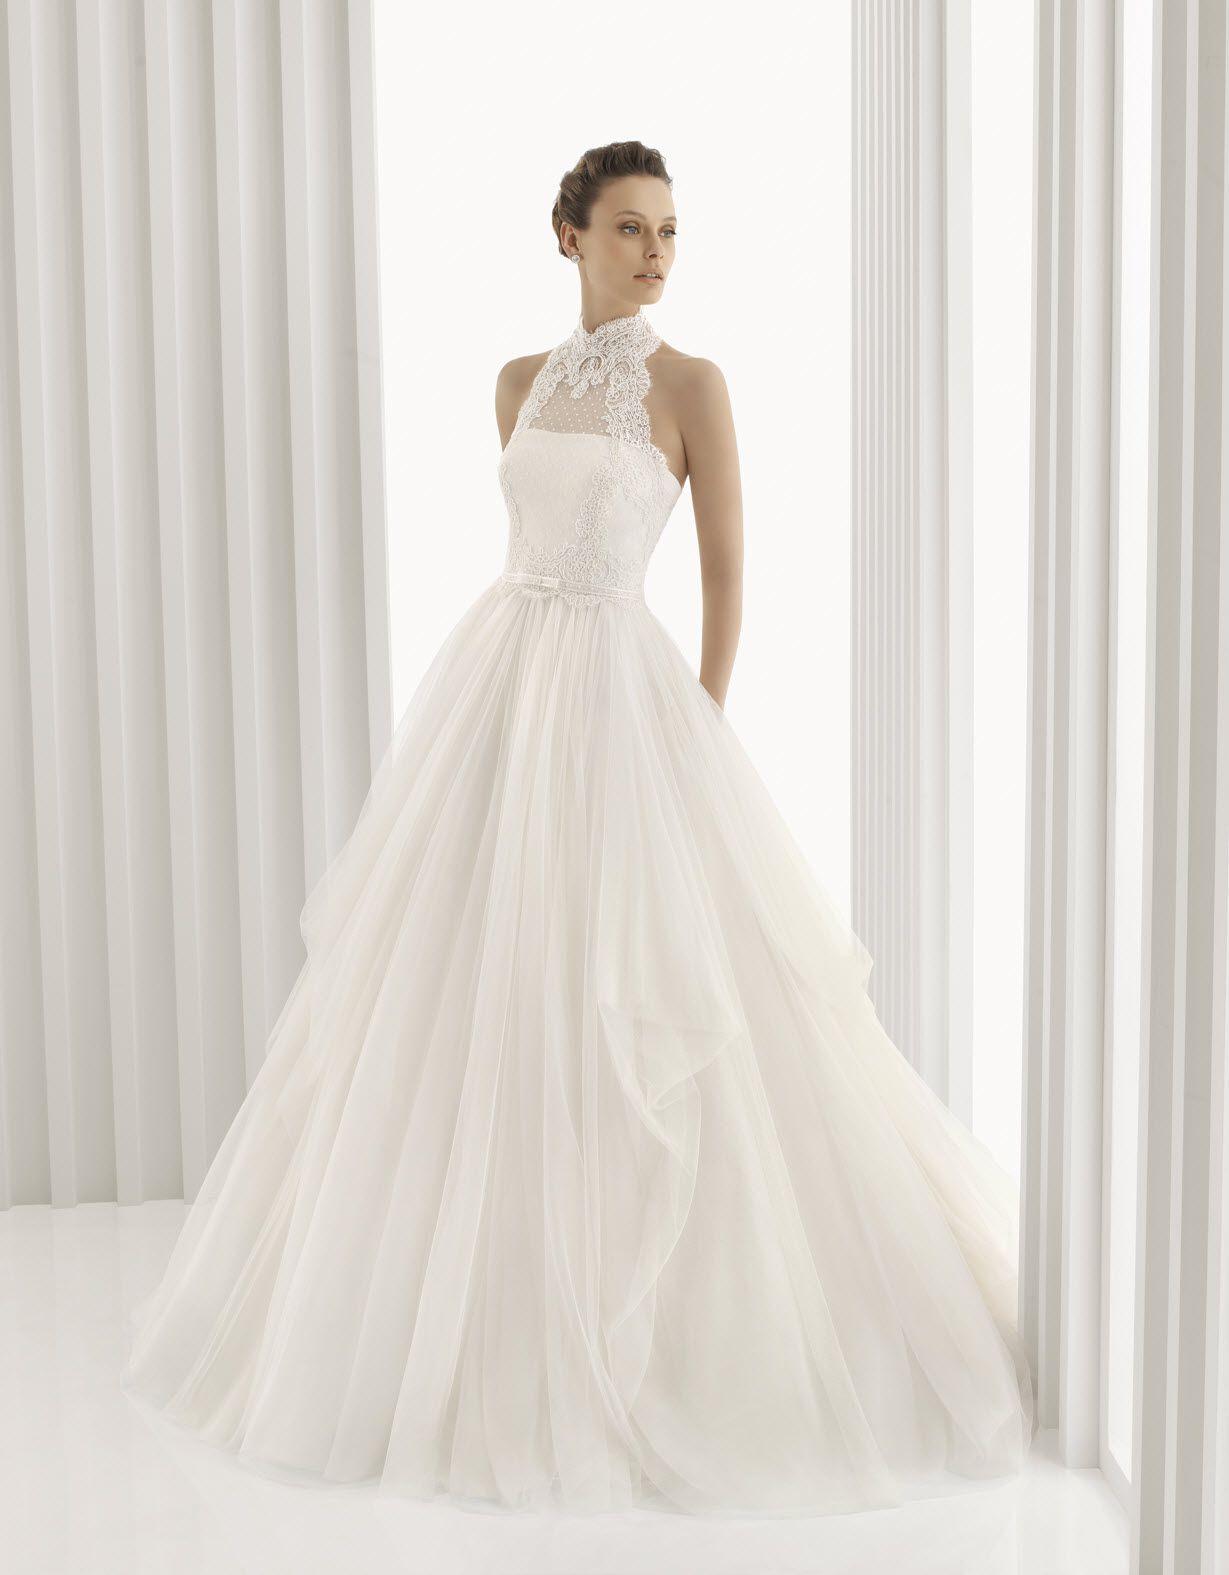 vintageweddingdresslongsleeveg Wedding dress